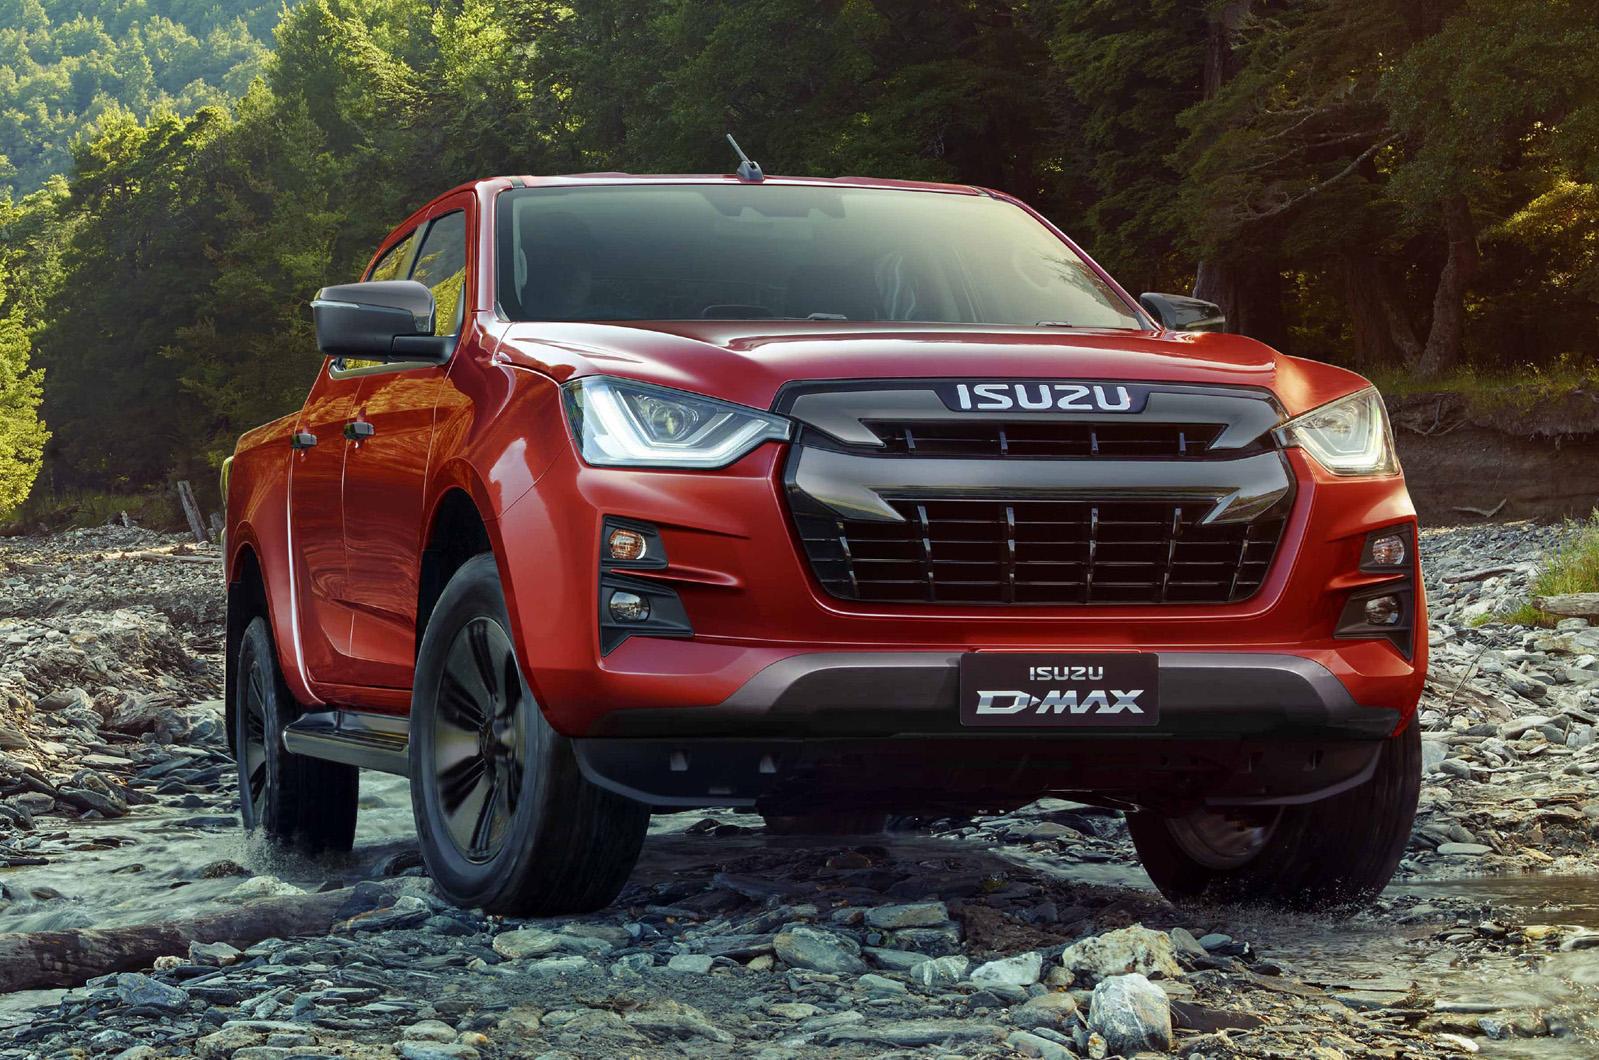 New 2021 Isuzu D-Max pick-up truck due in UK dealerships ...